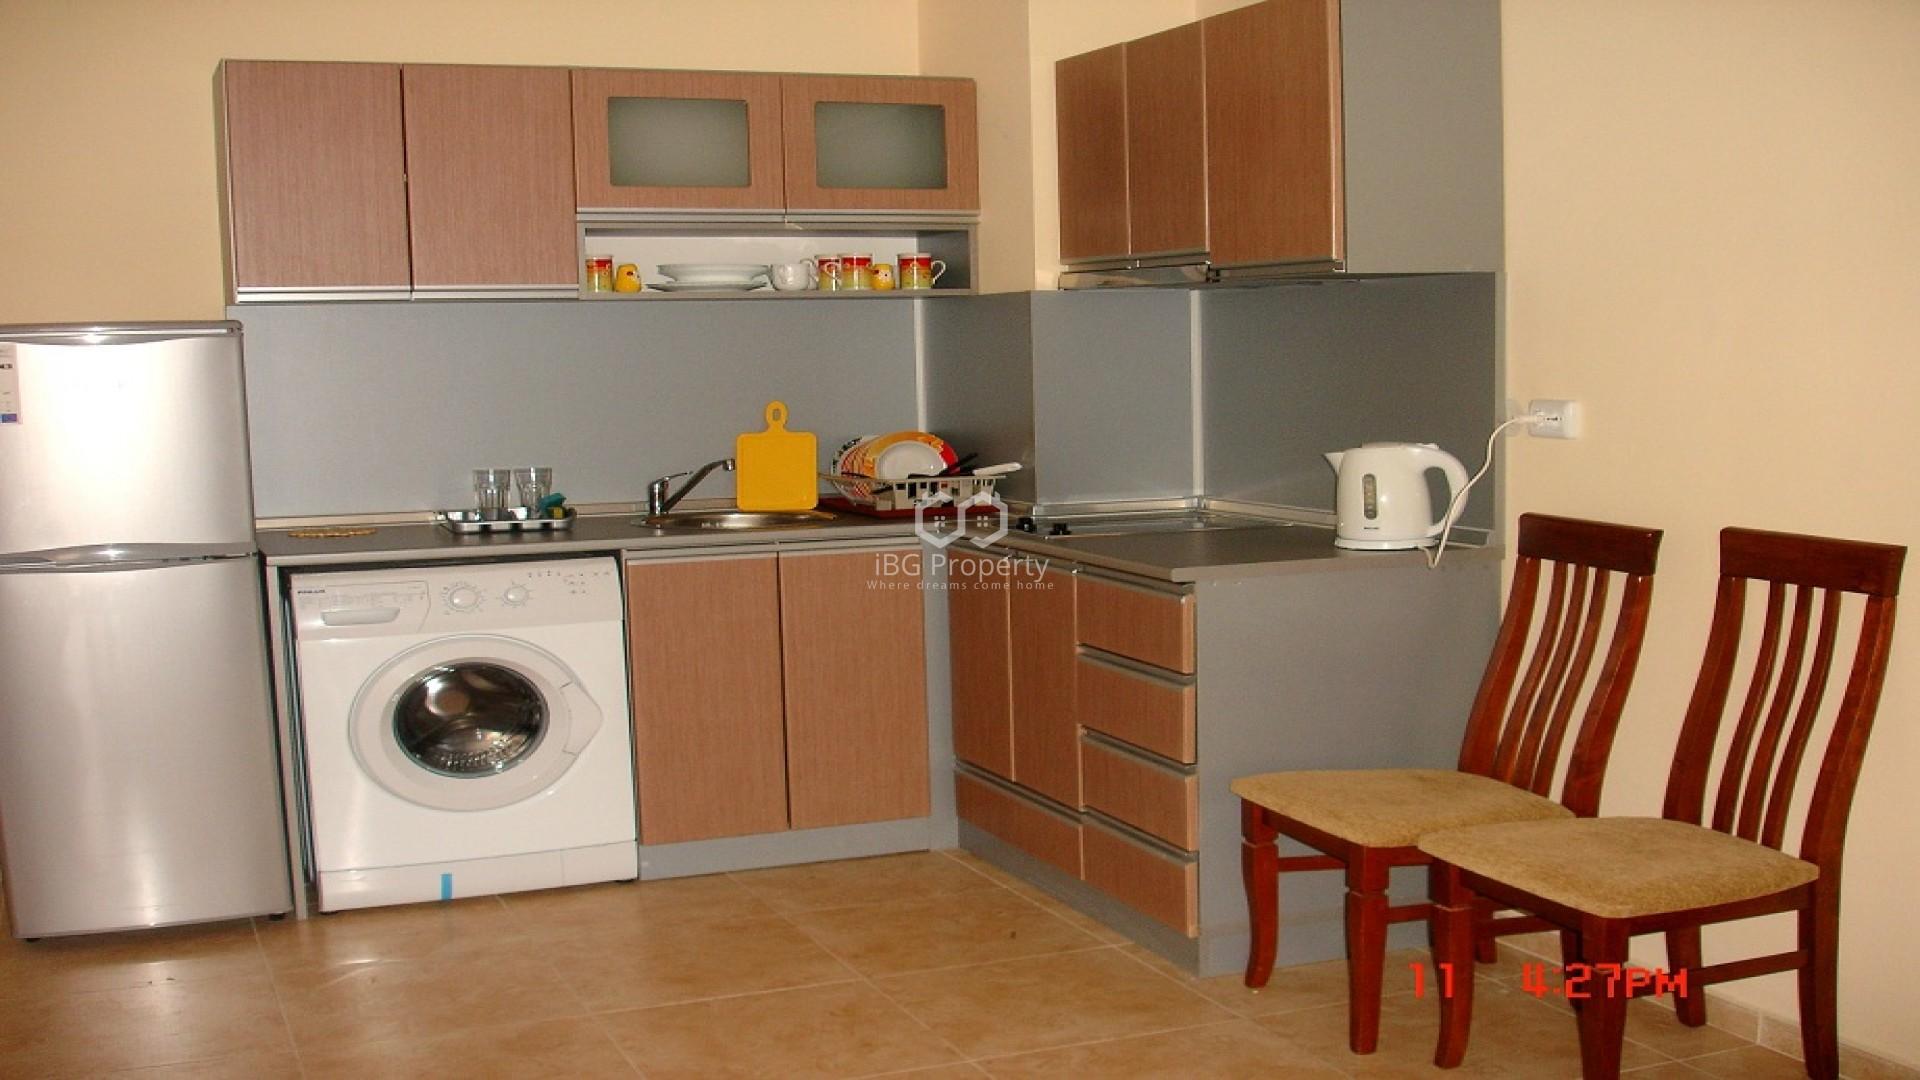 Двухкомнатная квартира Равда 59 m2